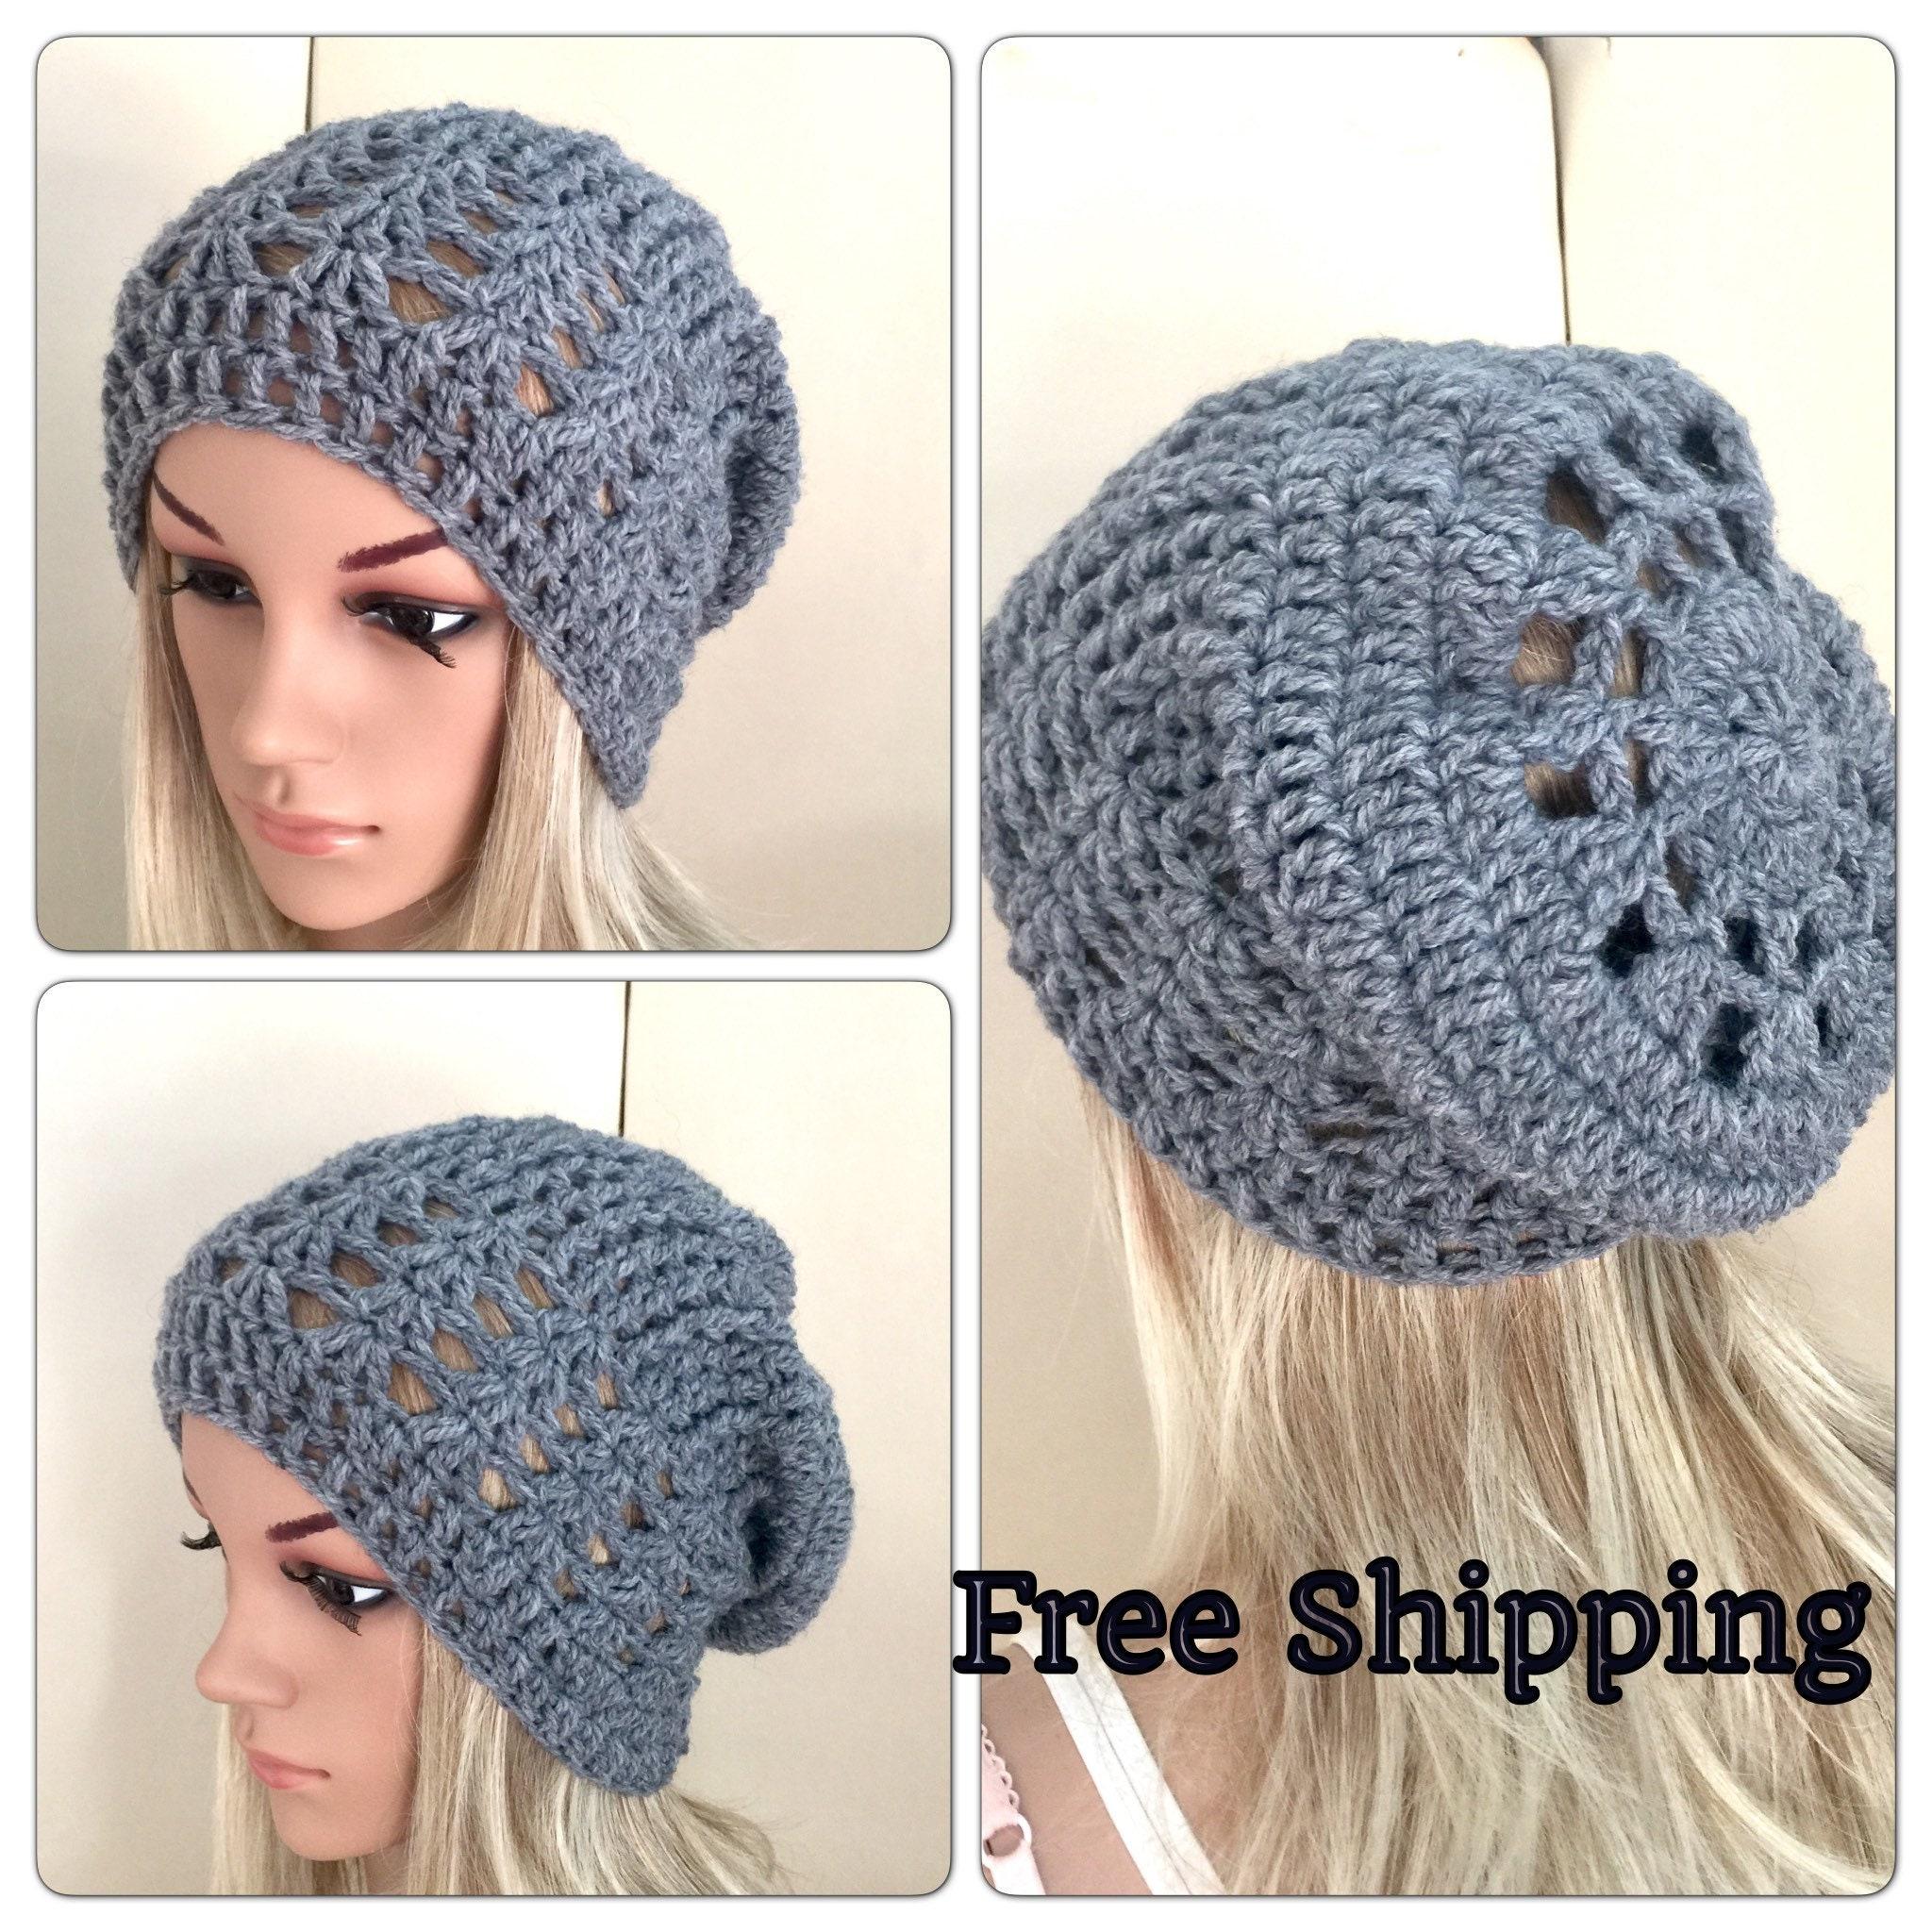 5b339b1aaa5 Grey slouch hat lace Womens hand crochet knit oversized slouchy beanie  snood hat rainbow hippie boho tam teens unique designer mandala